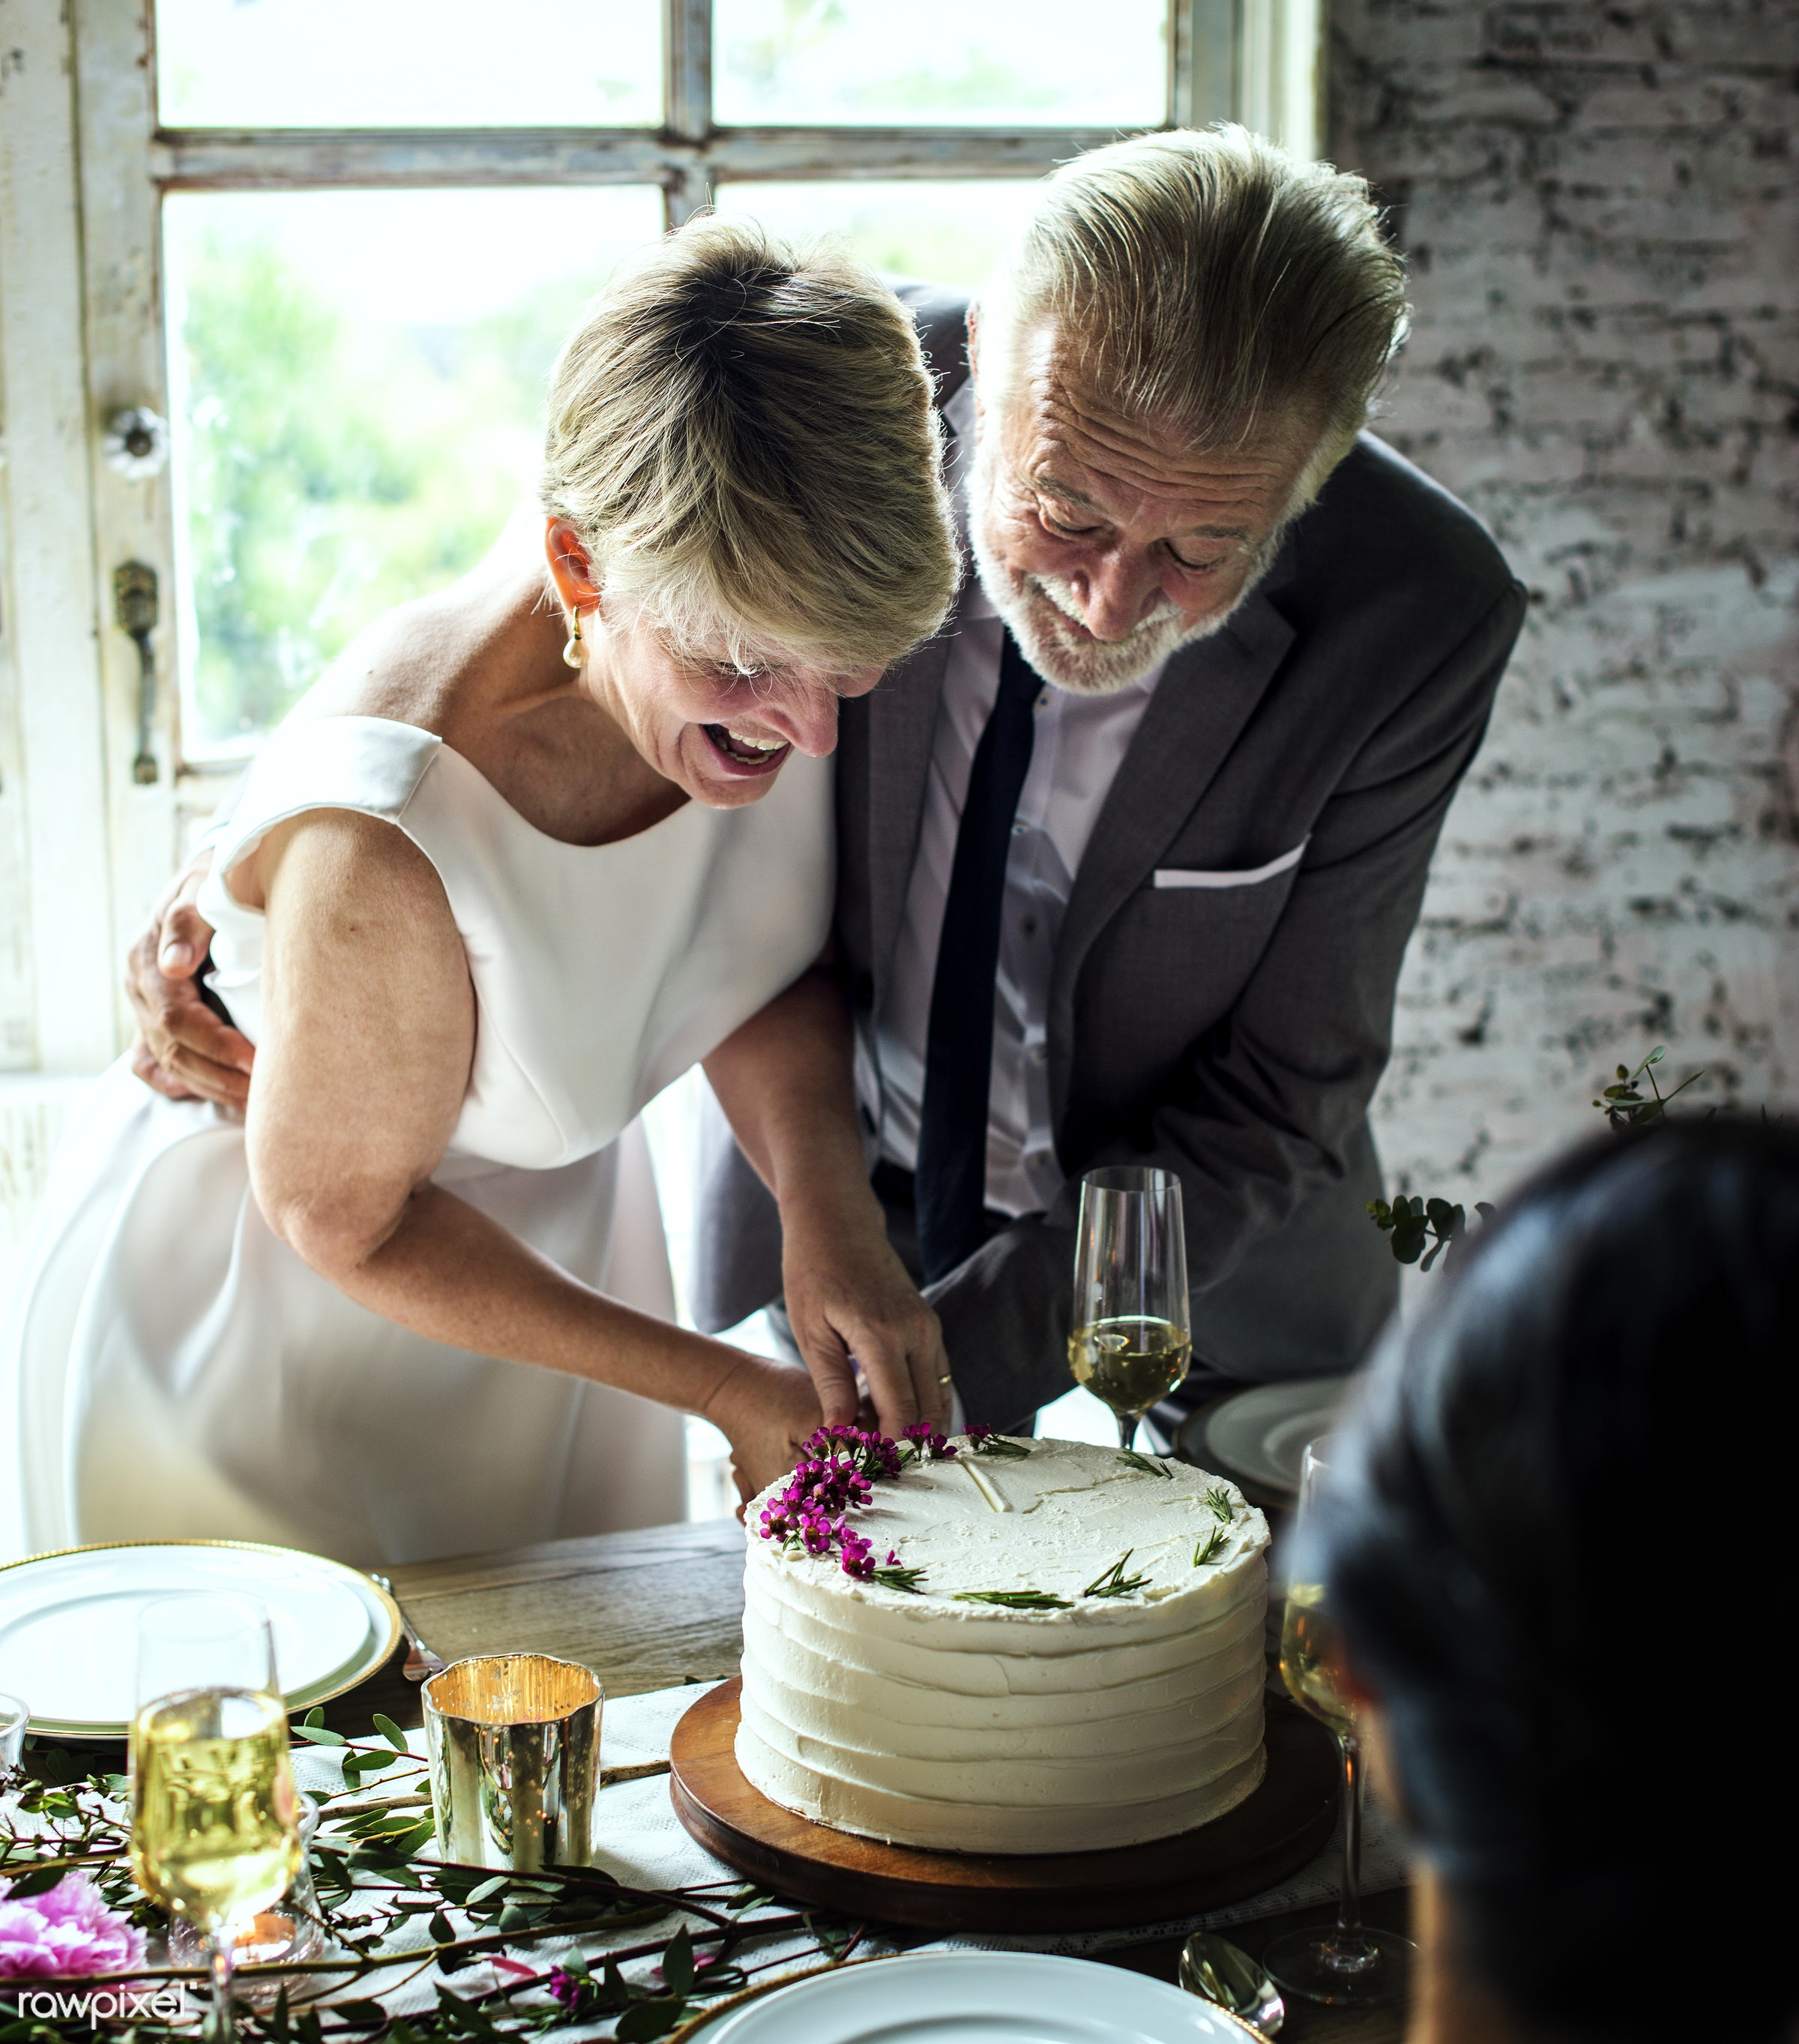 cake, celebrate, elder, event, bride, celebration, ceremony, closeup, congrats, congratulations, couple, cut, dessert,...